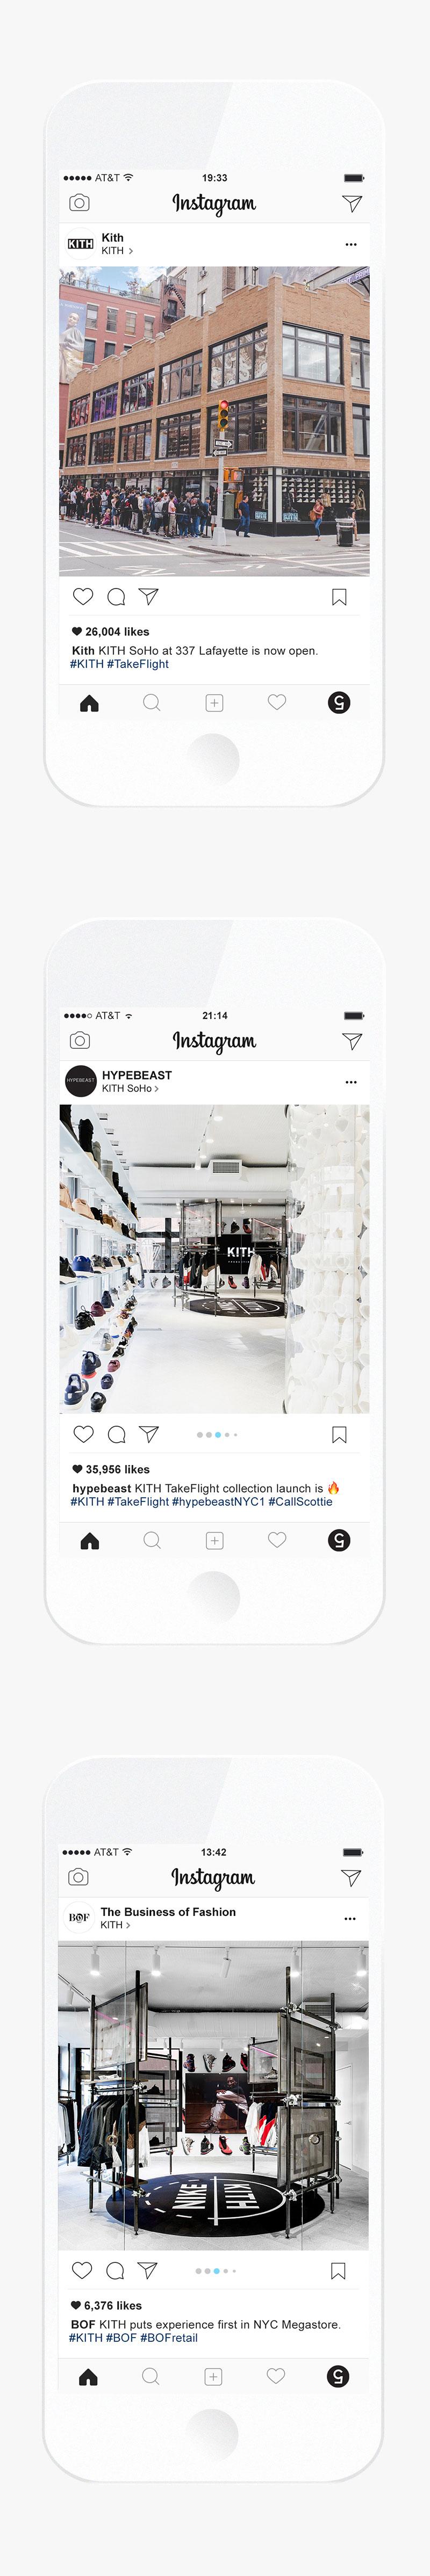 Nikex Kith Social Phones Mobile